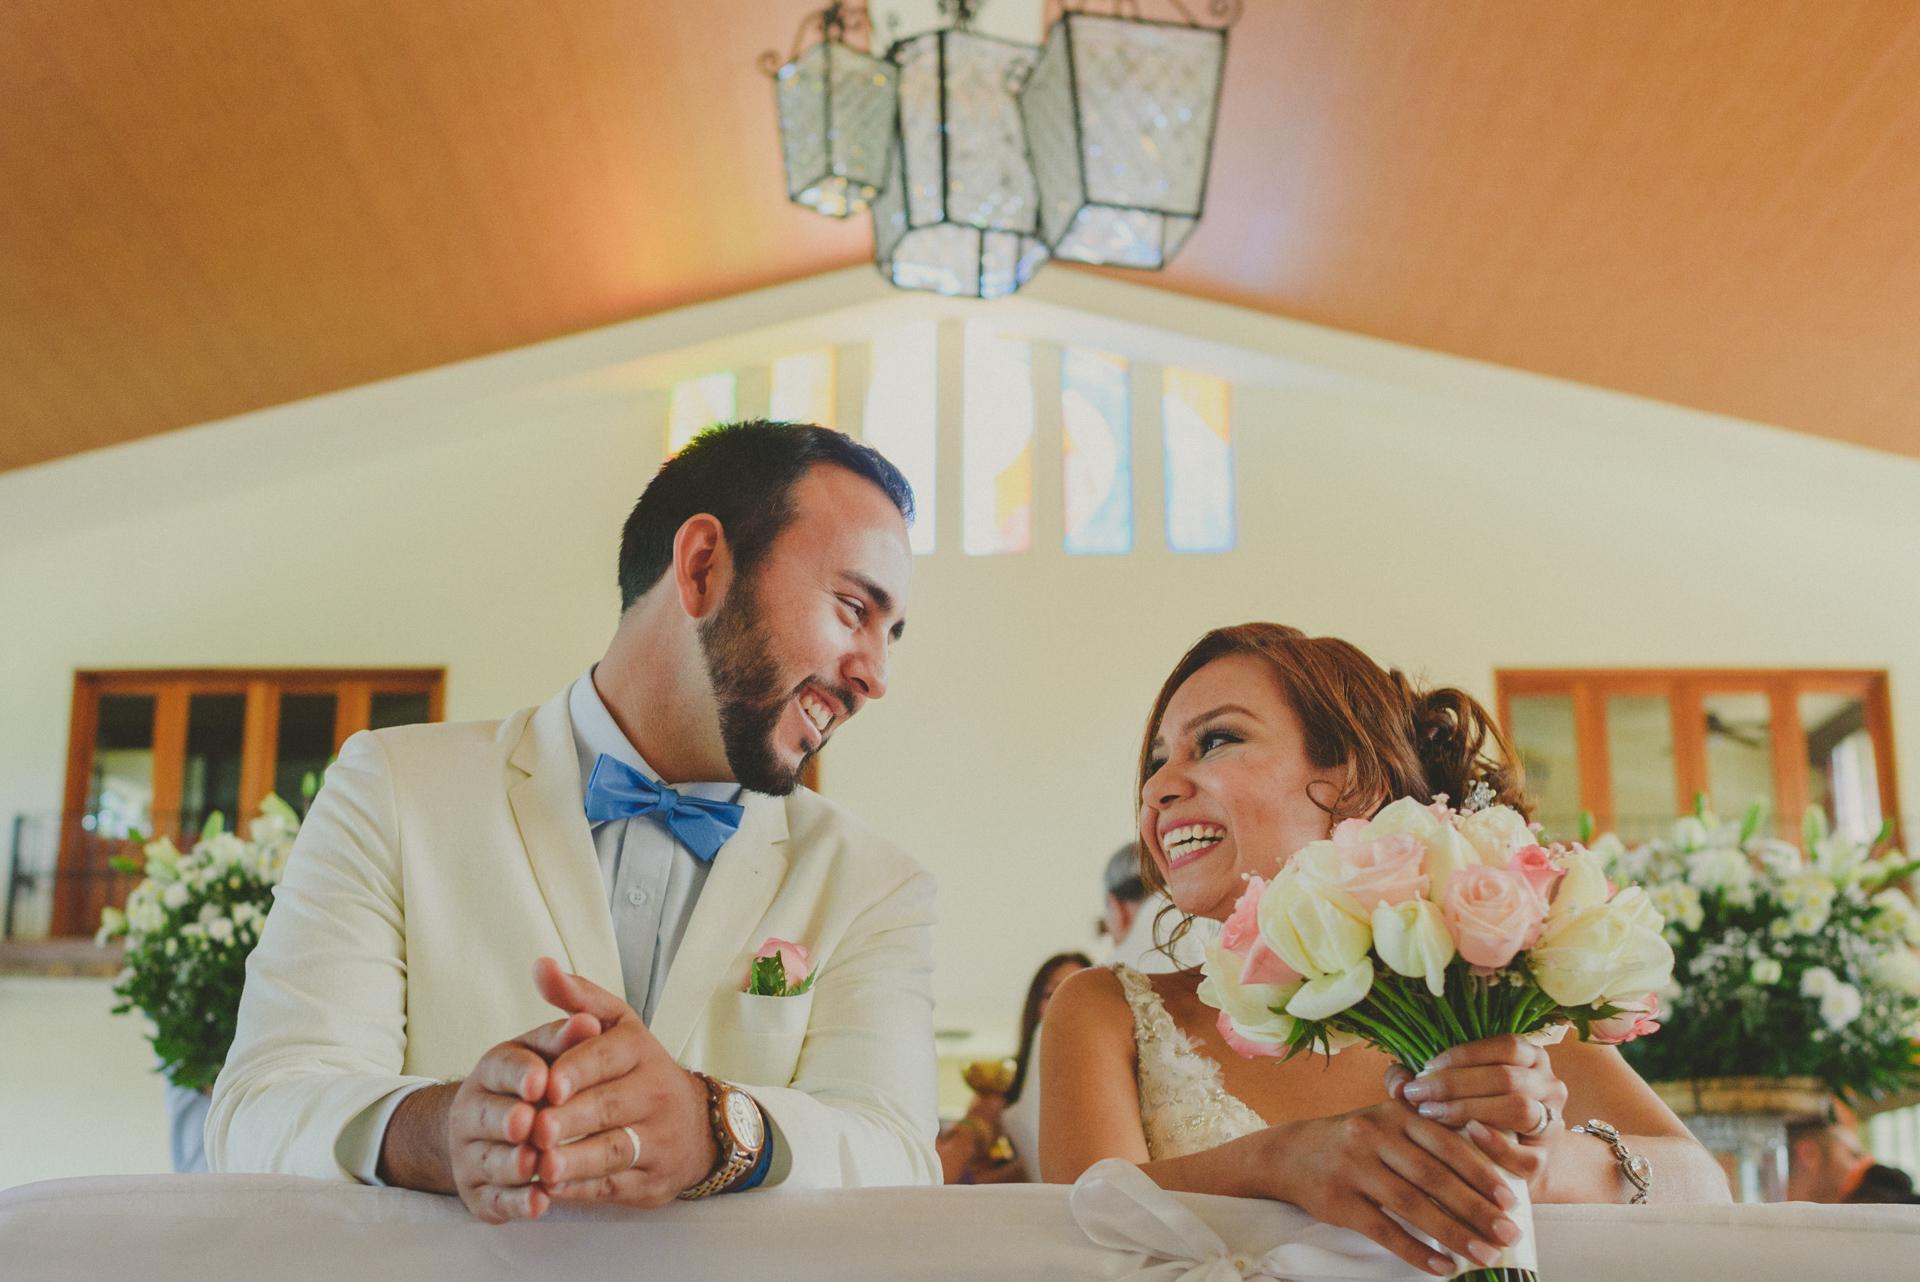 Wedding N&M BLOG luishoudin.com (62 de 174)